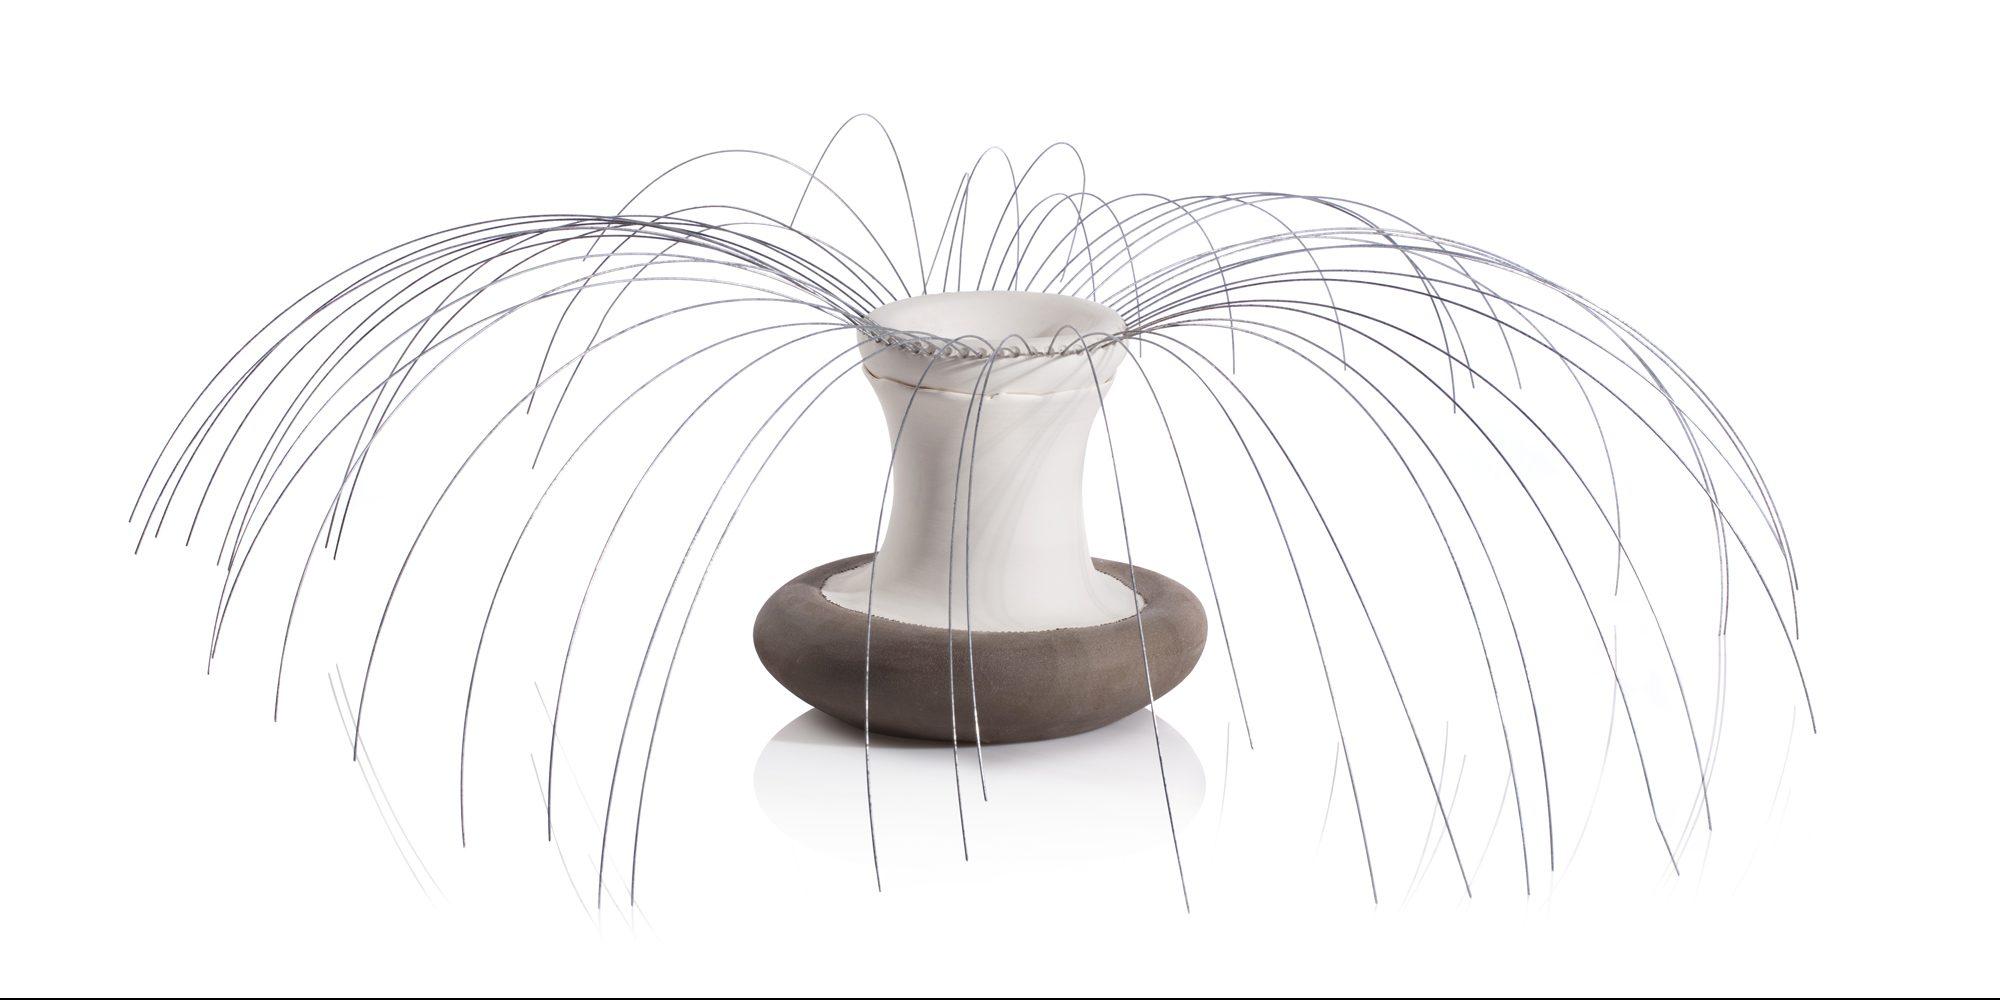 Intermediate Wheel Throwing/ Porcelain Bowls / Gilit Ronen Levin